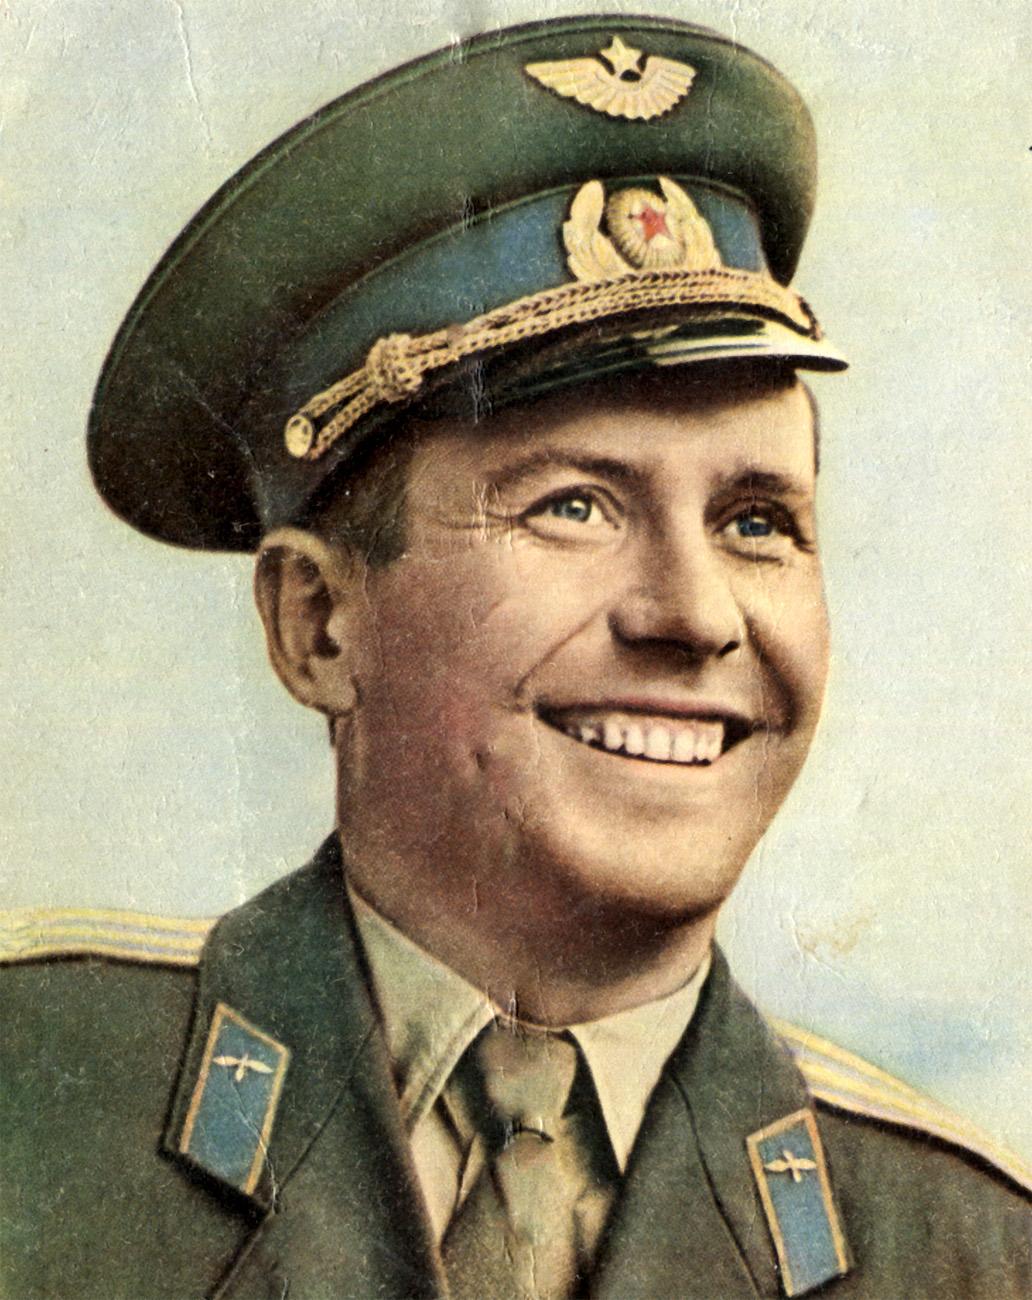 Cosmonaut Popovich